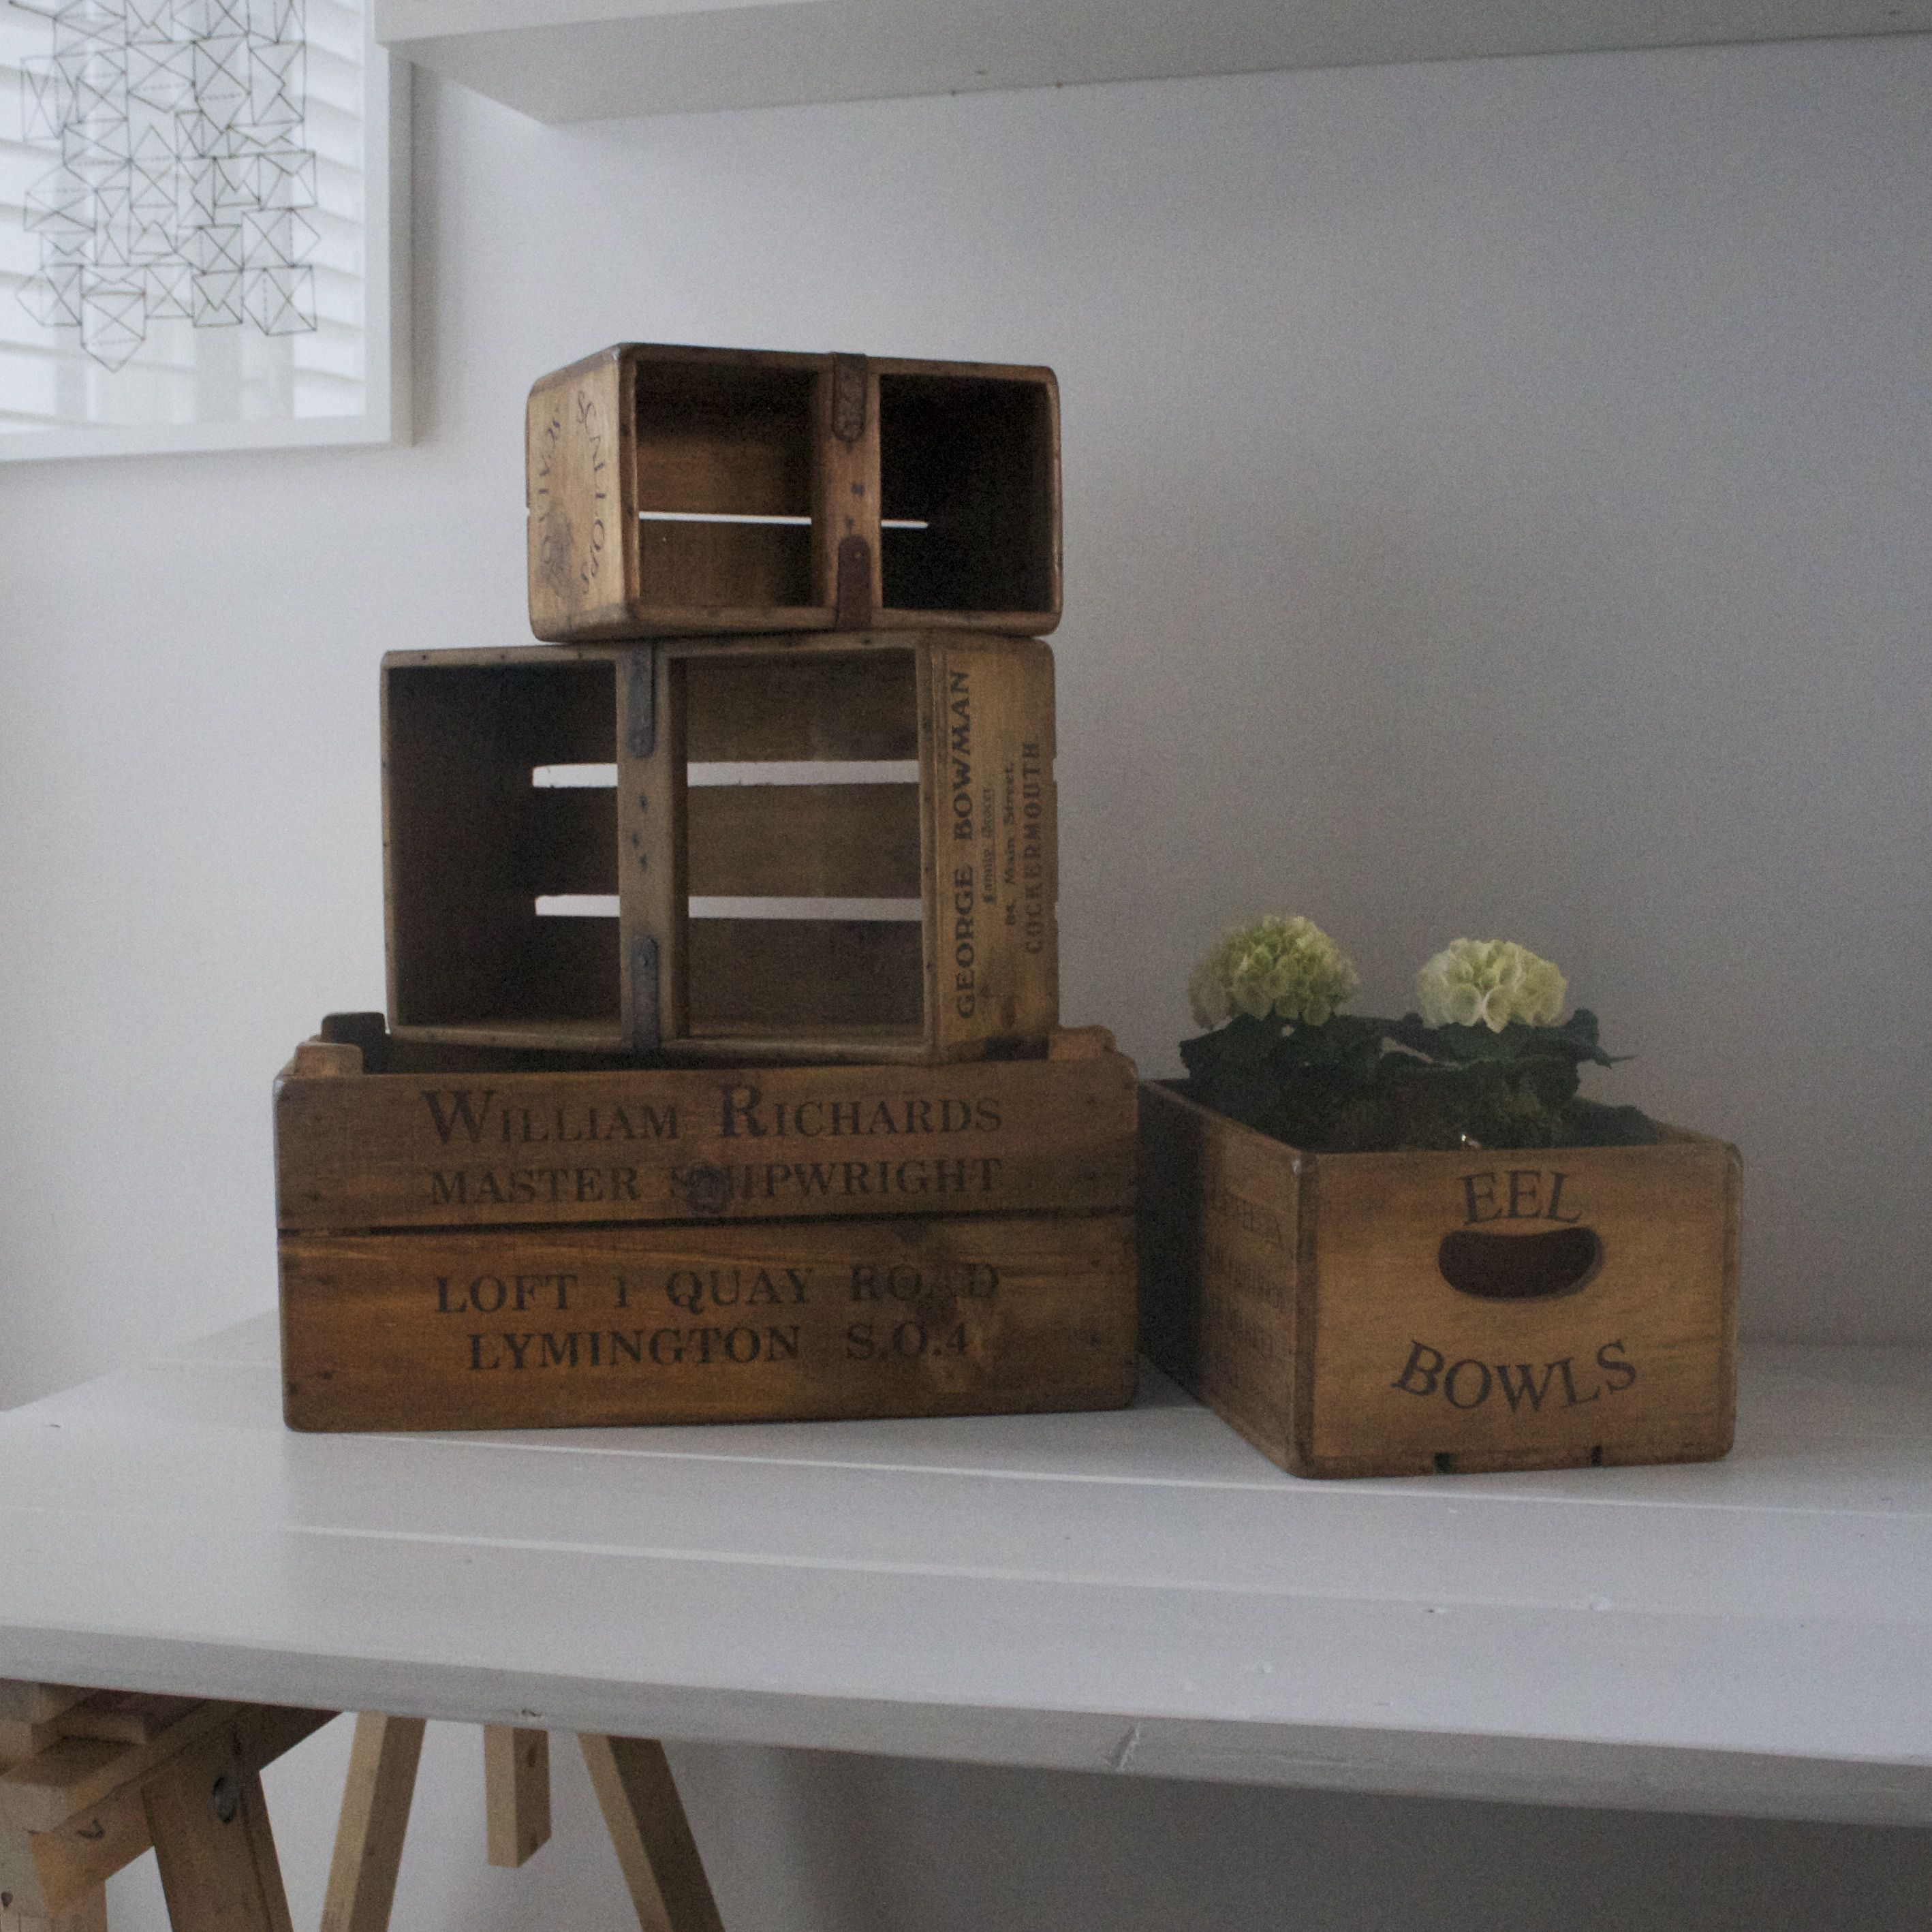 Design Vintage Wood Crates Fish Crates Herb Boxes Vintage Wood Crates Wood Crates Crate Herbs